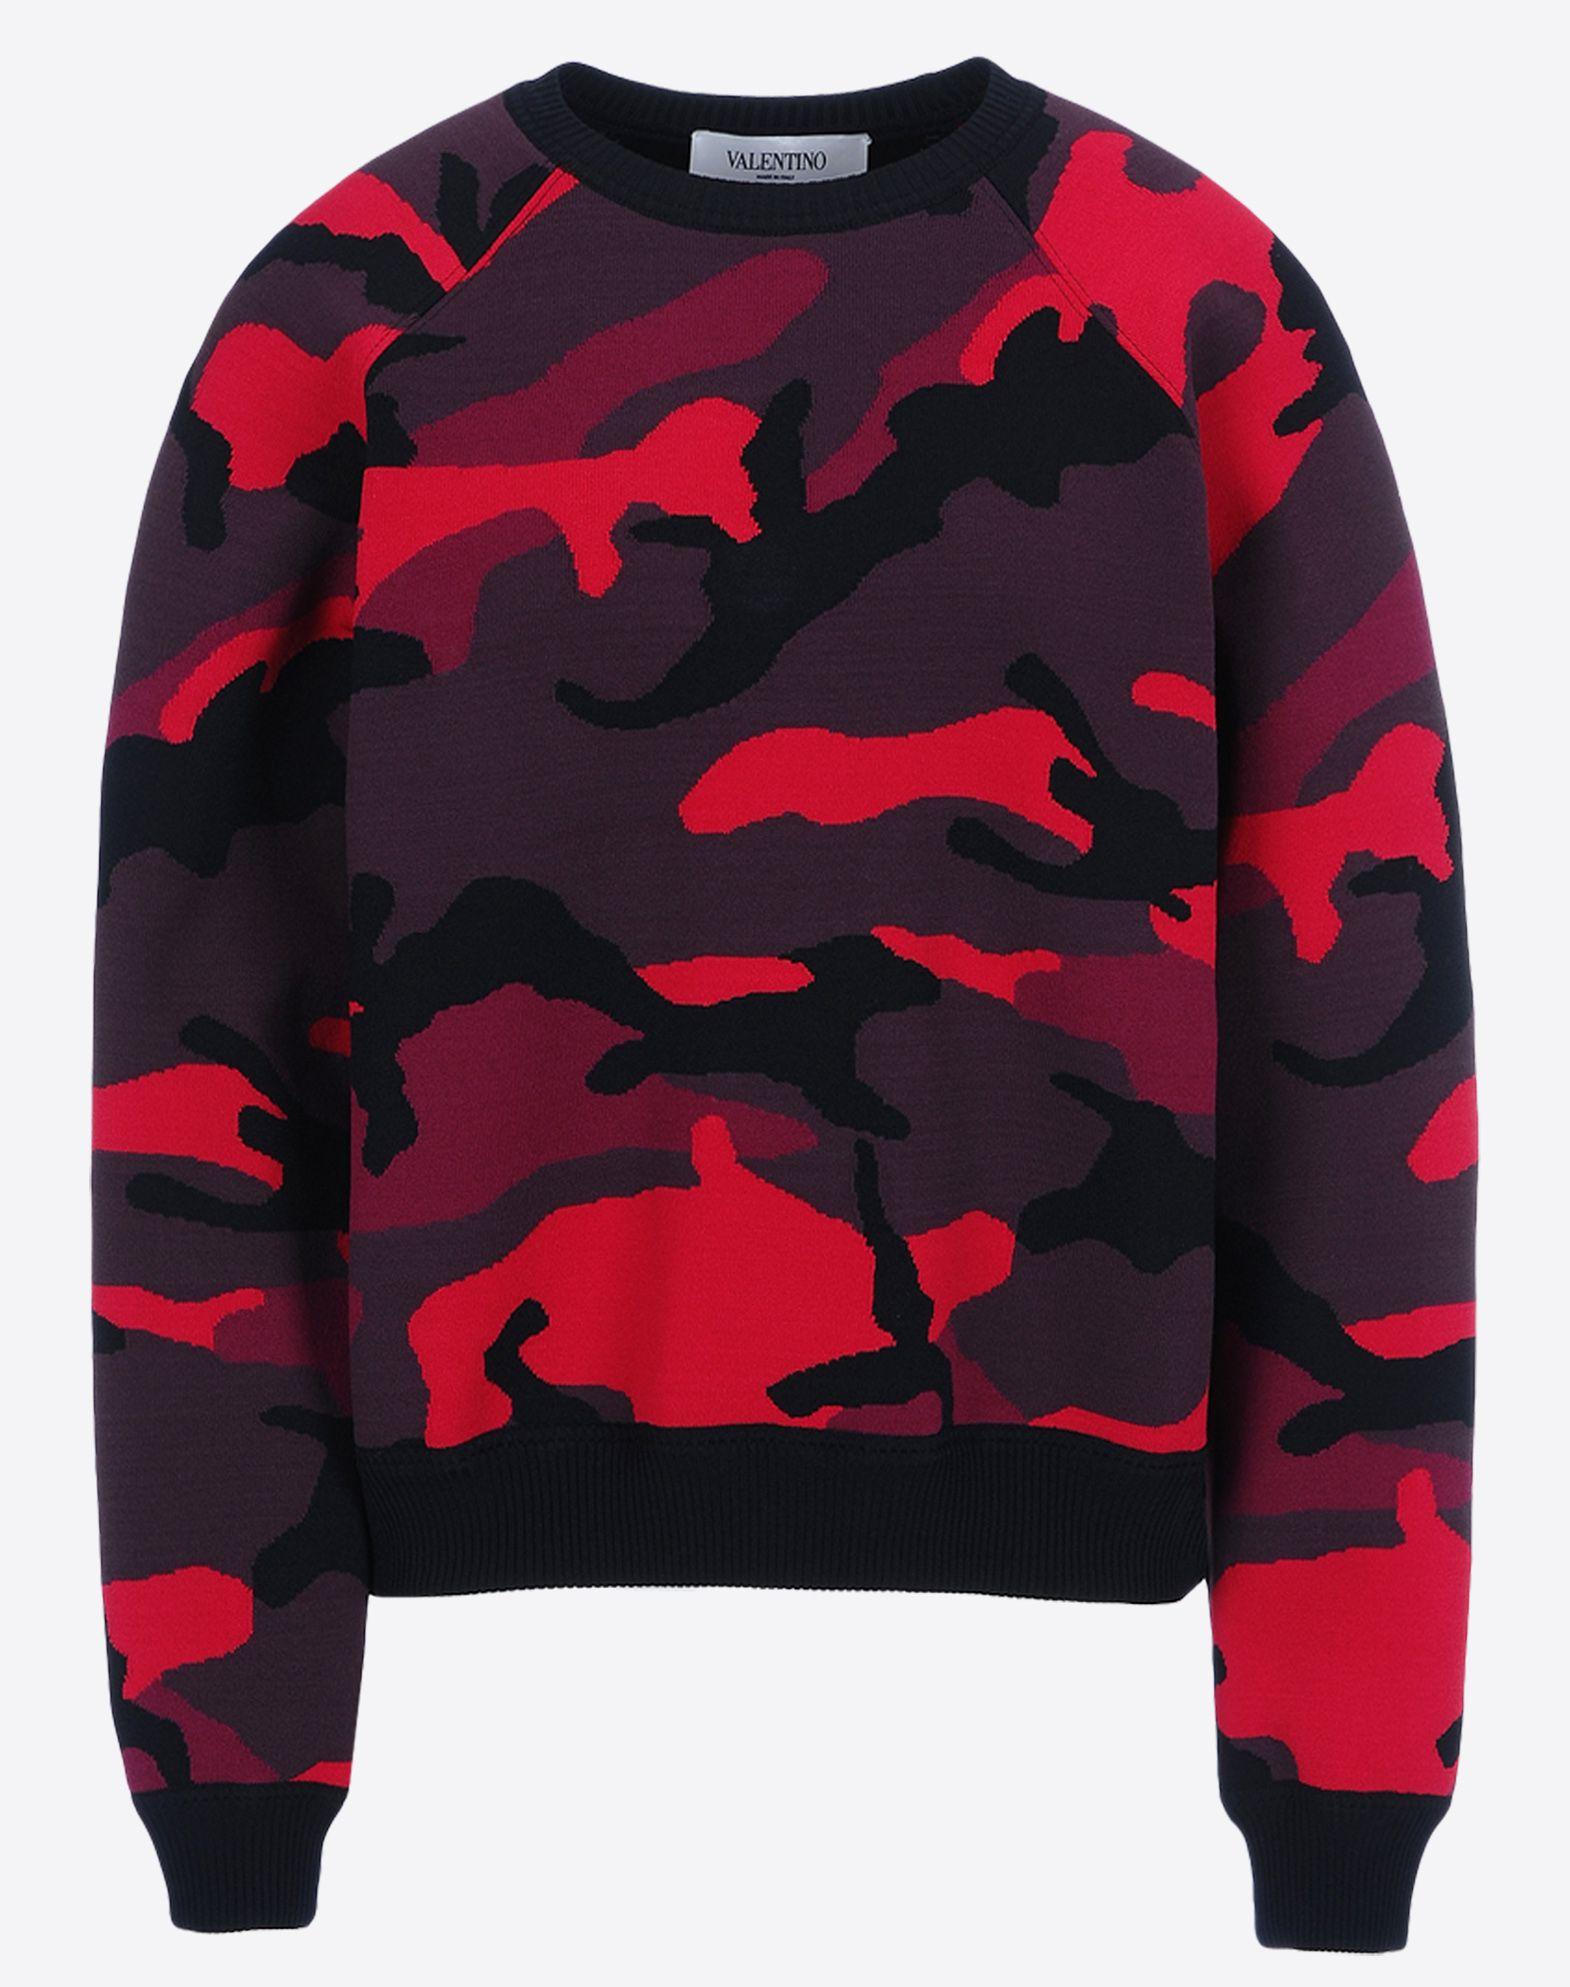 VALENTINO HBK908SF-VM1643B A13 Knitwear, shirts and tops D d